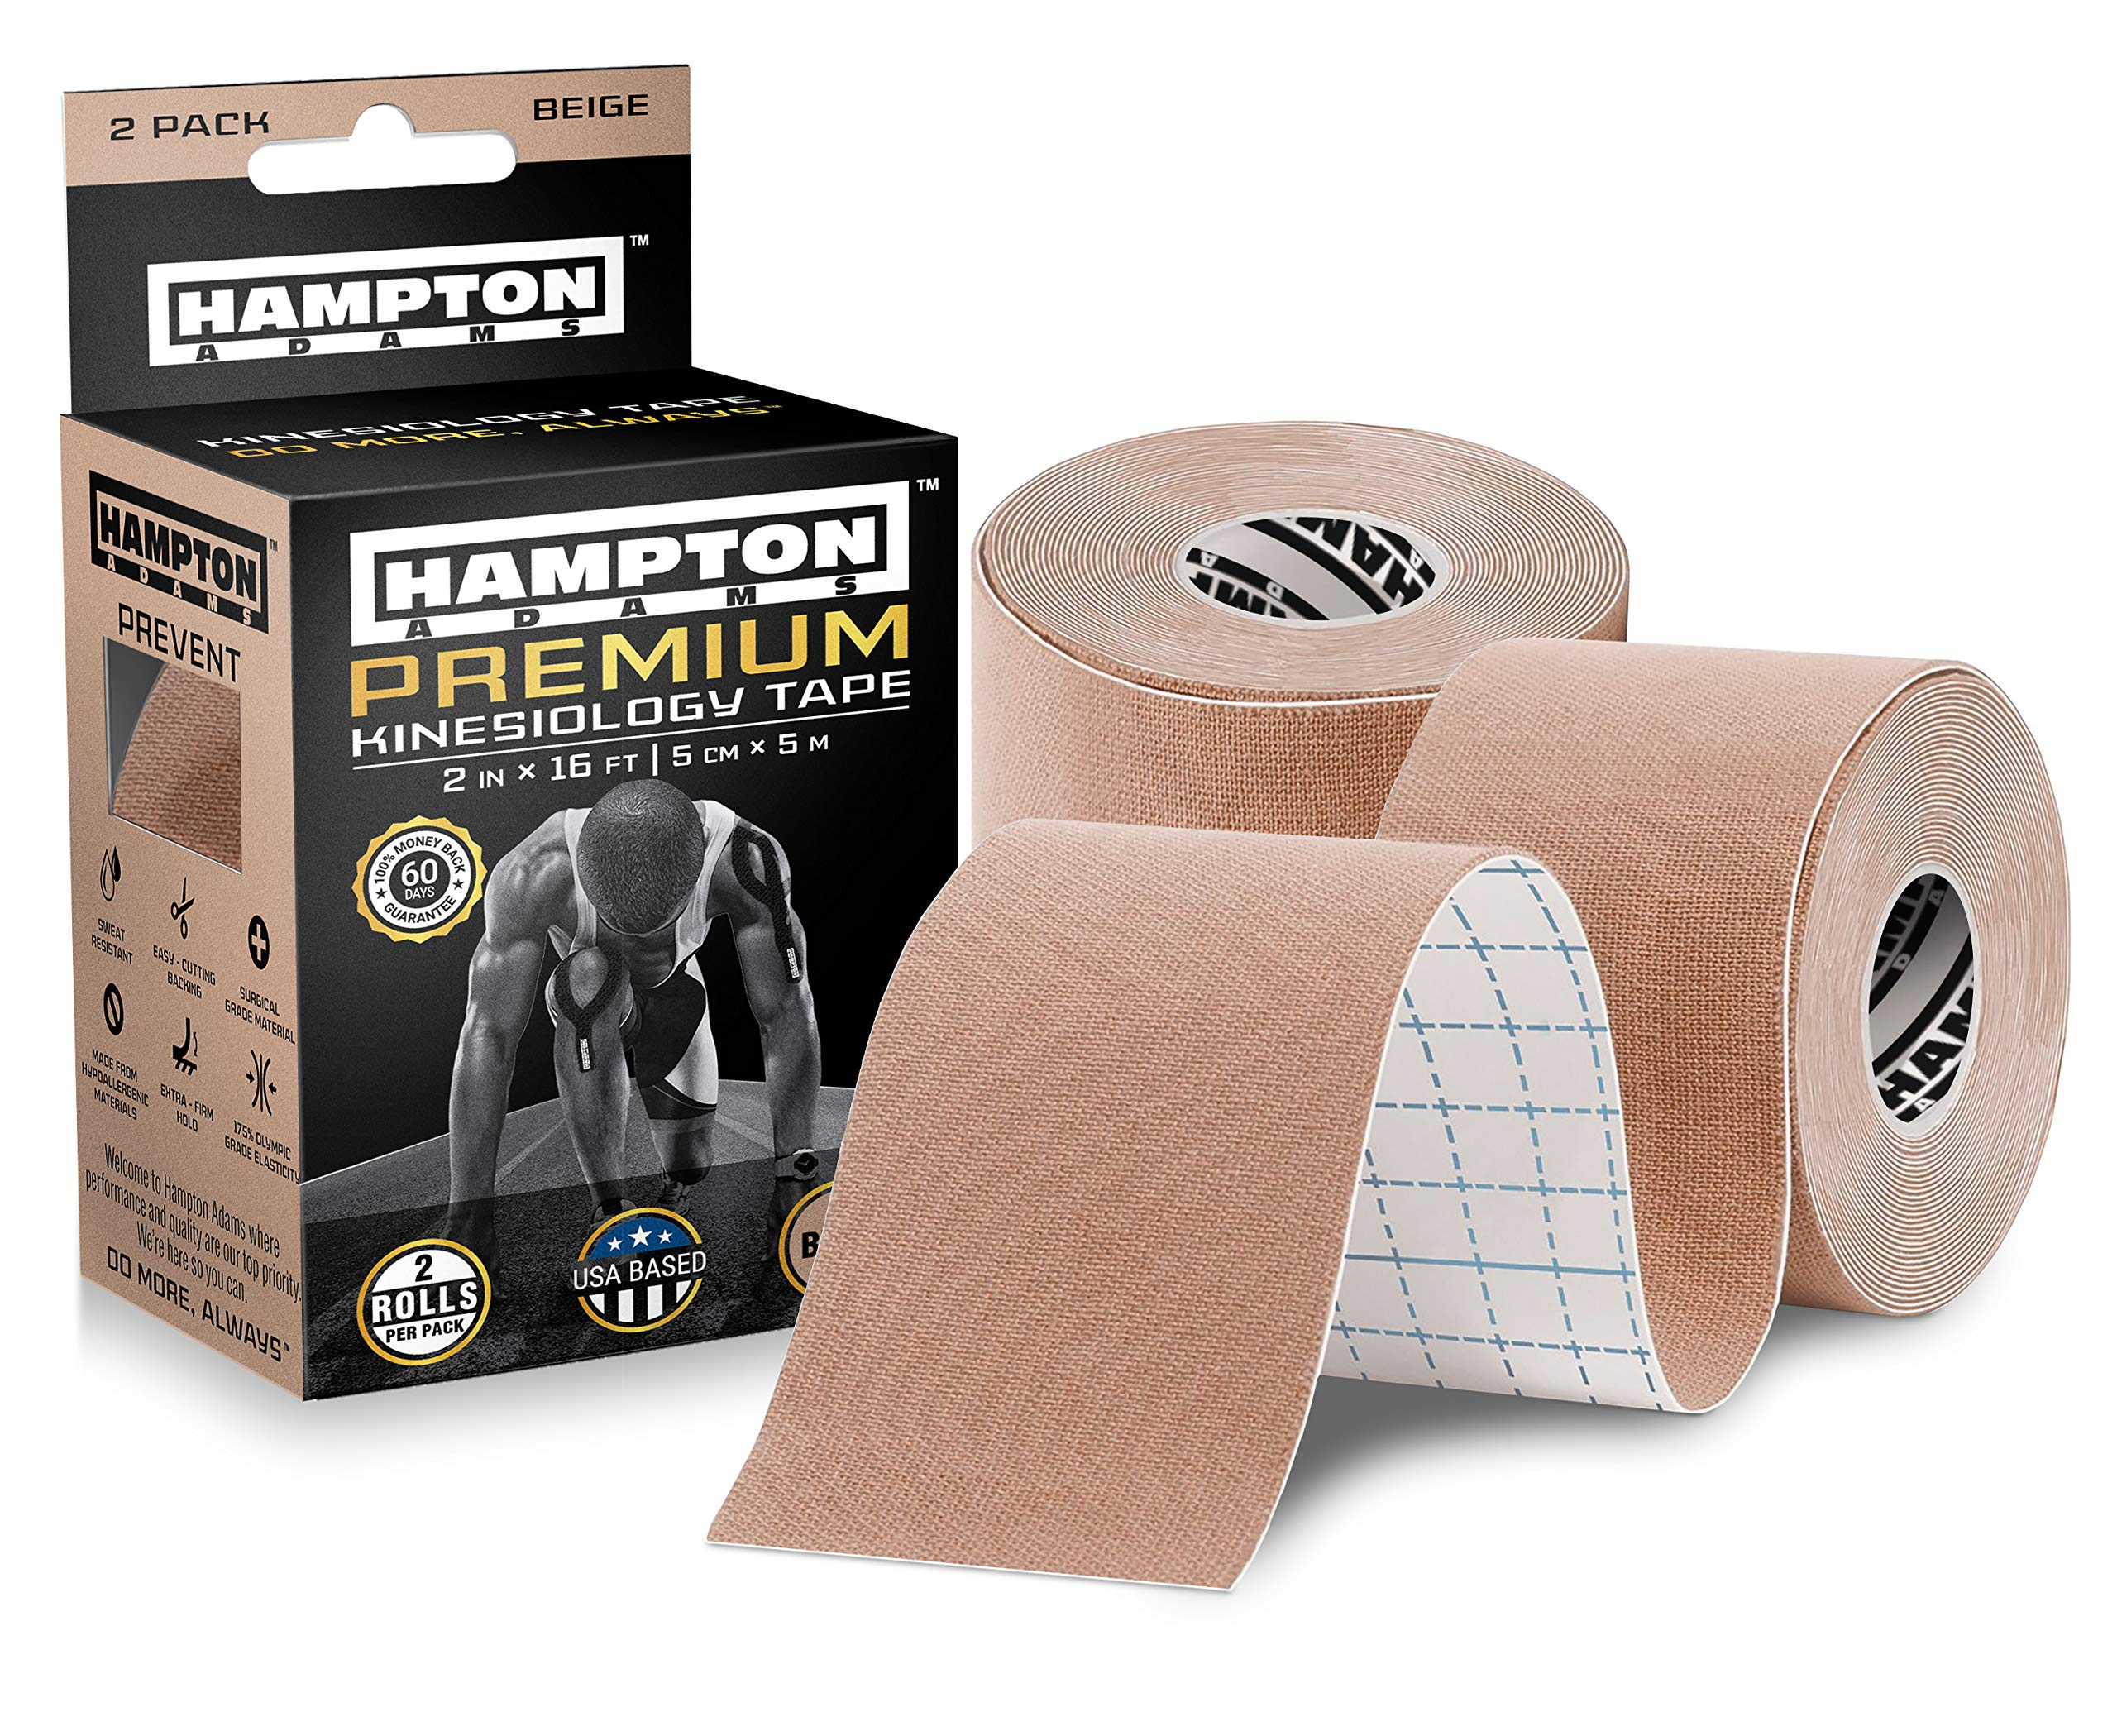 Premium Kinesiology Tape | Athletic Tape Supports & Protects Muscles, Knees, Shoulders & Plantar Fasciitis | Waterproof & Hypoallergenic | 2-Pack Beige Uncut Kinesio Tape